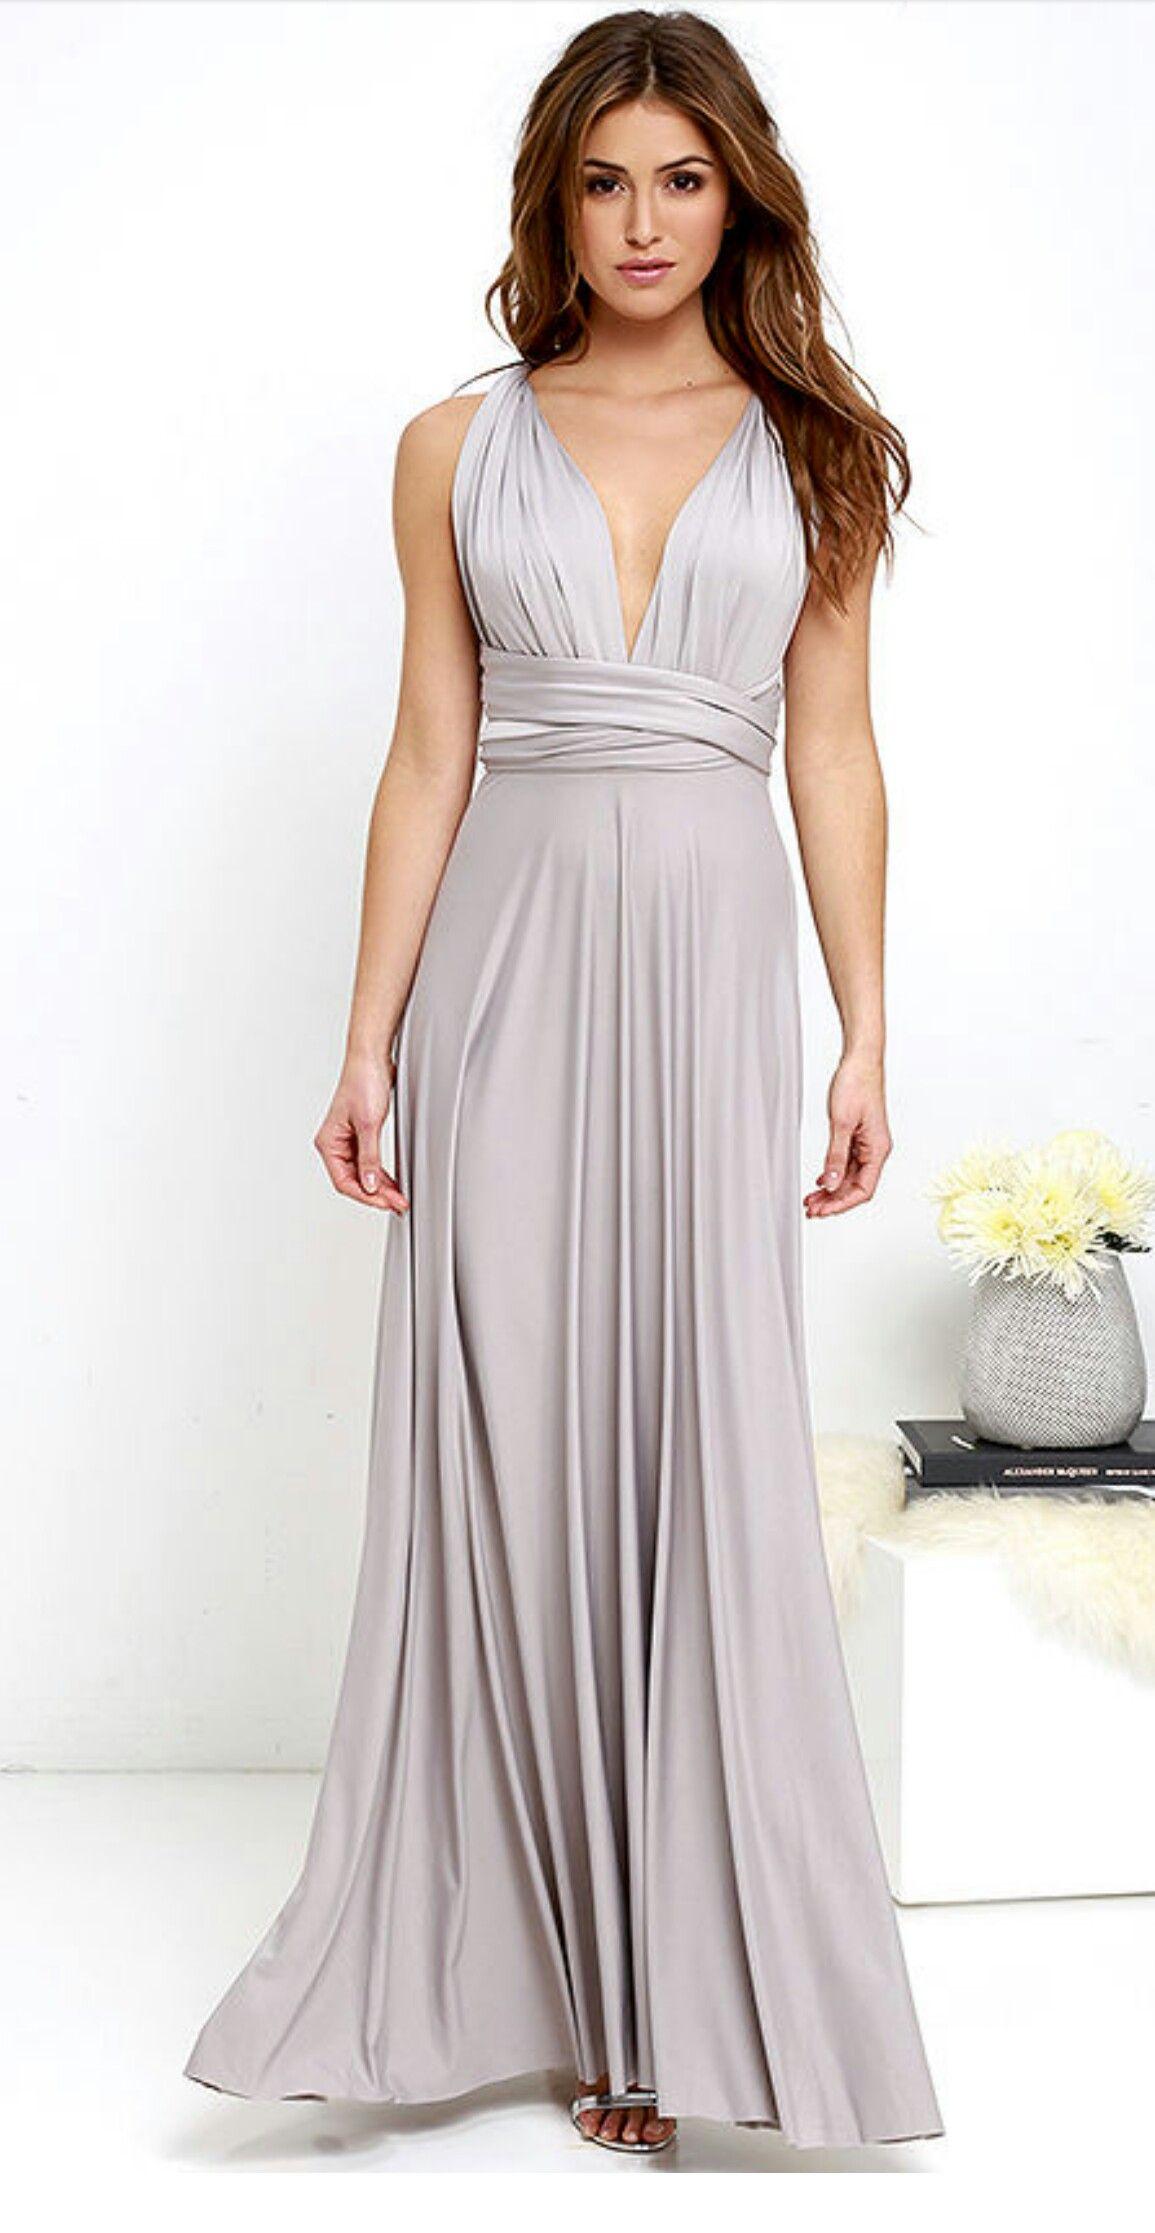 Pin by Angela on Wedding in 2020 Maxi dress, Maxi dress